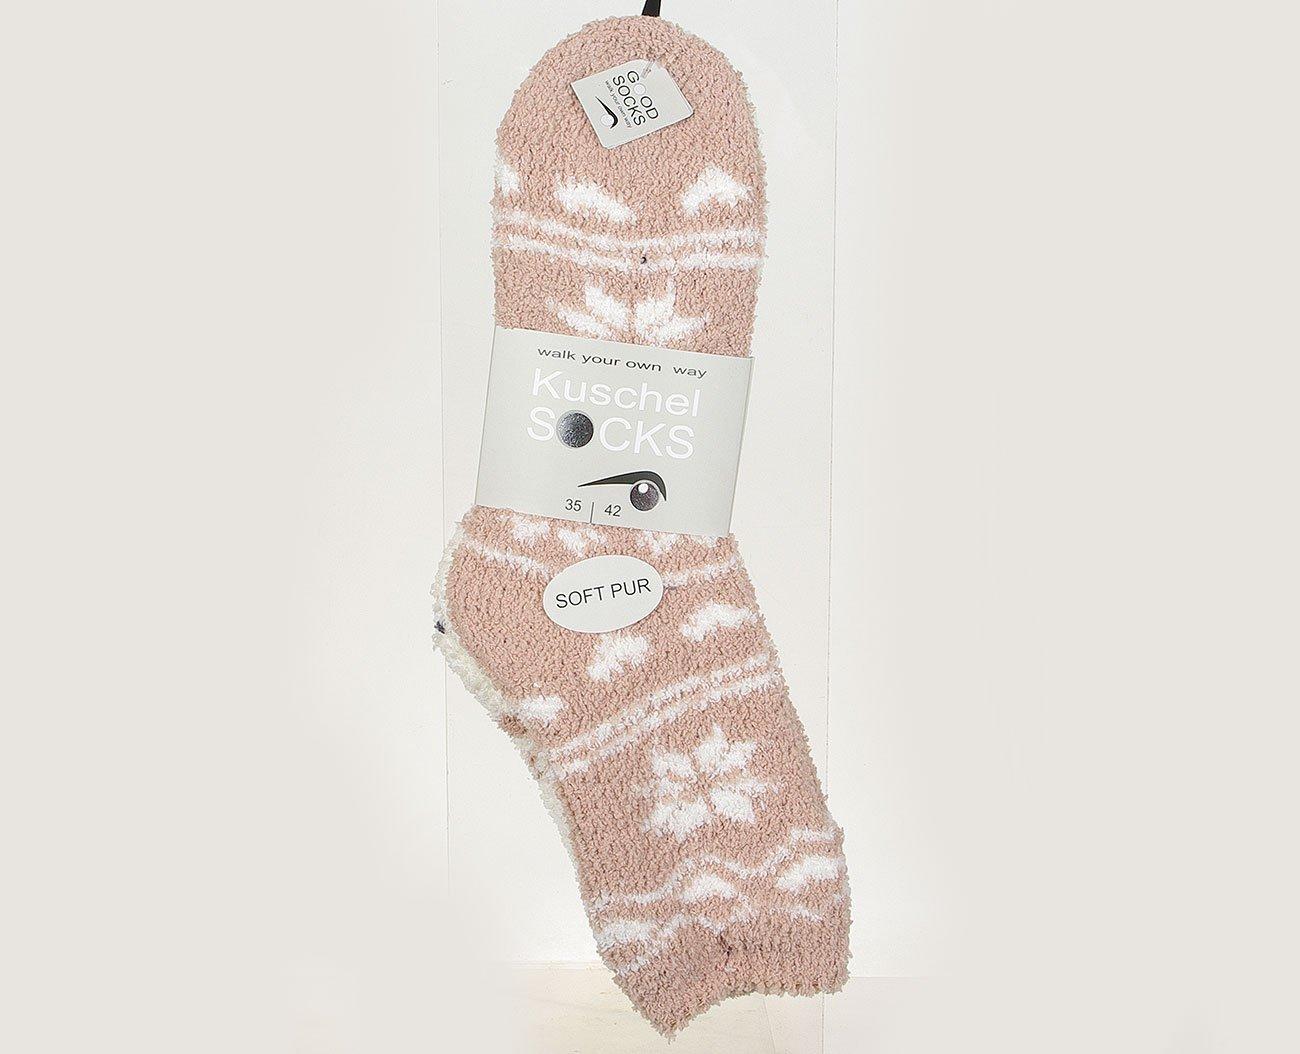 Good Socks Kuschel Soocks 375907 Beige skarpety